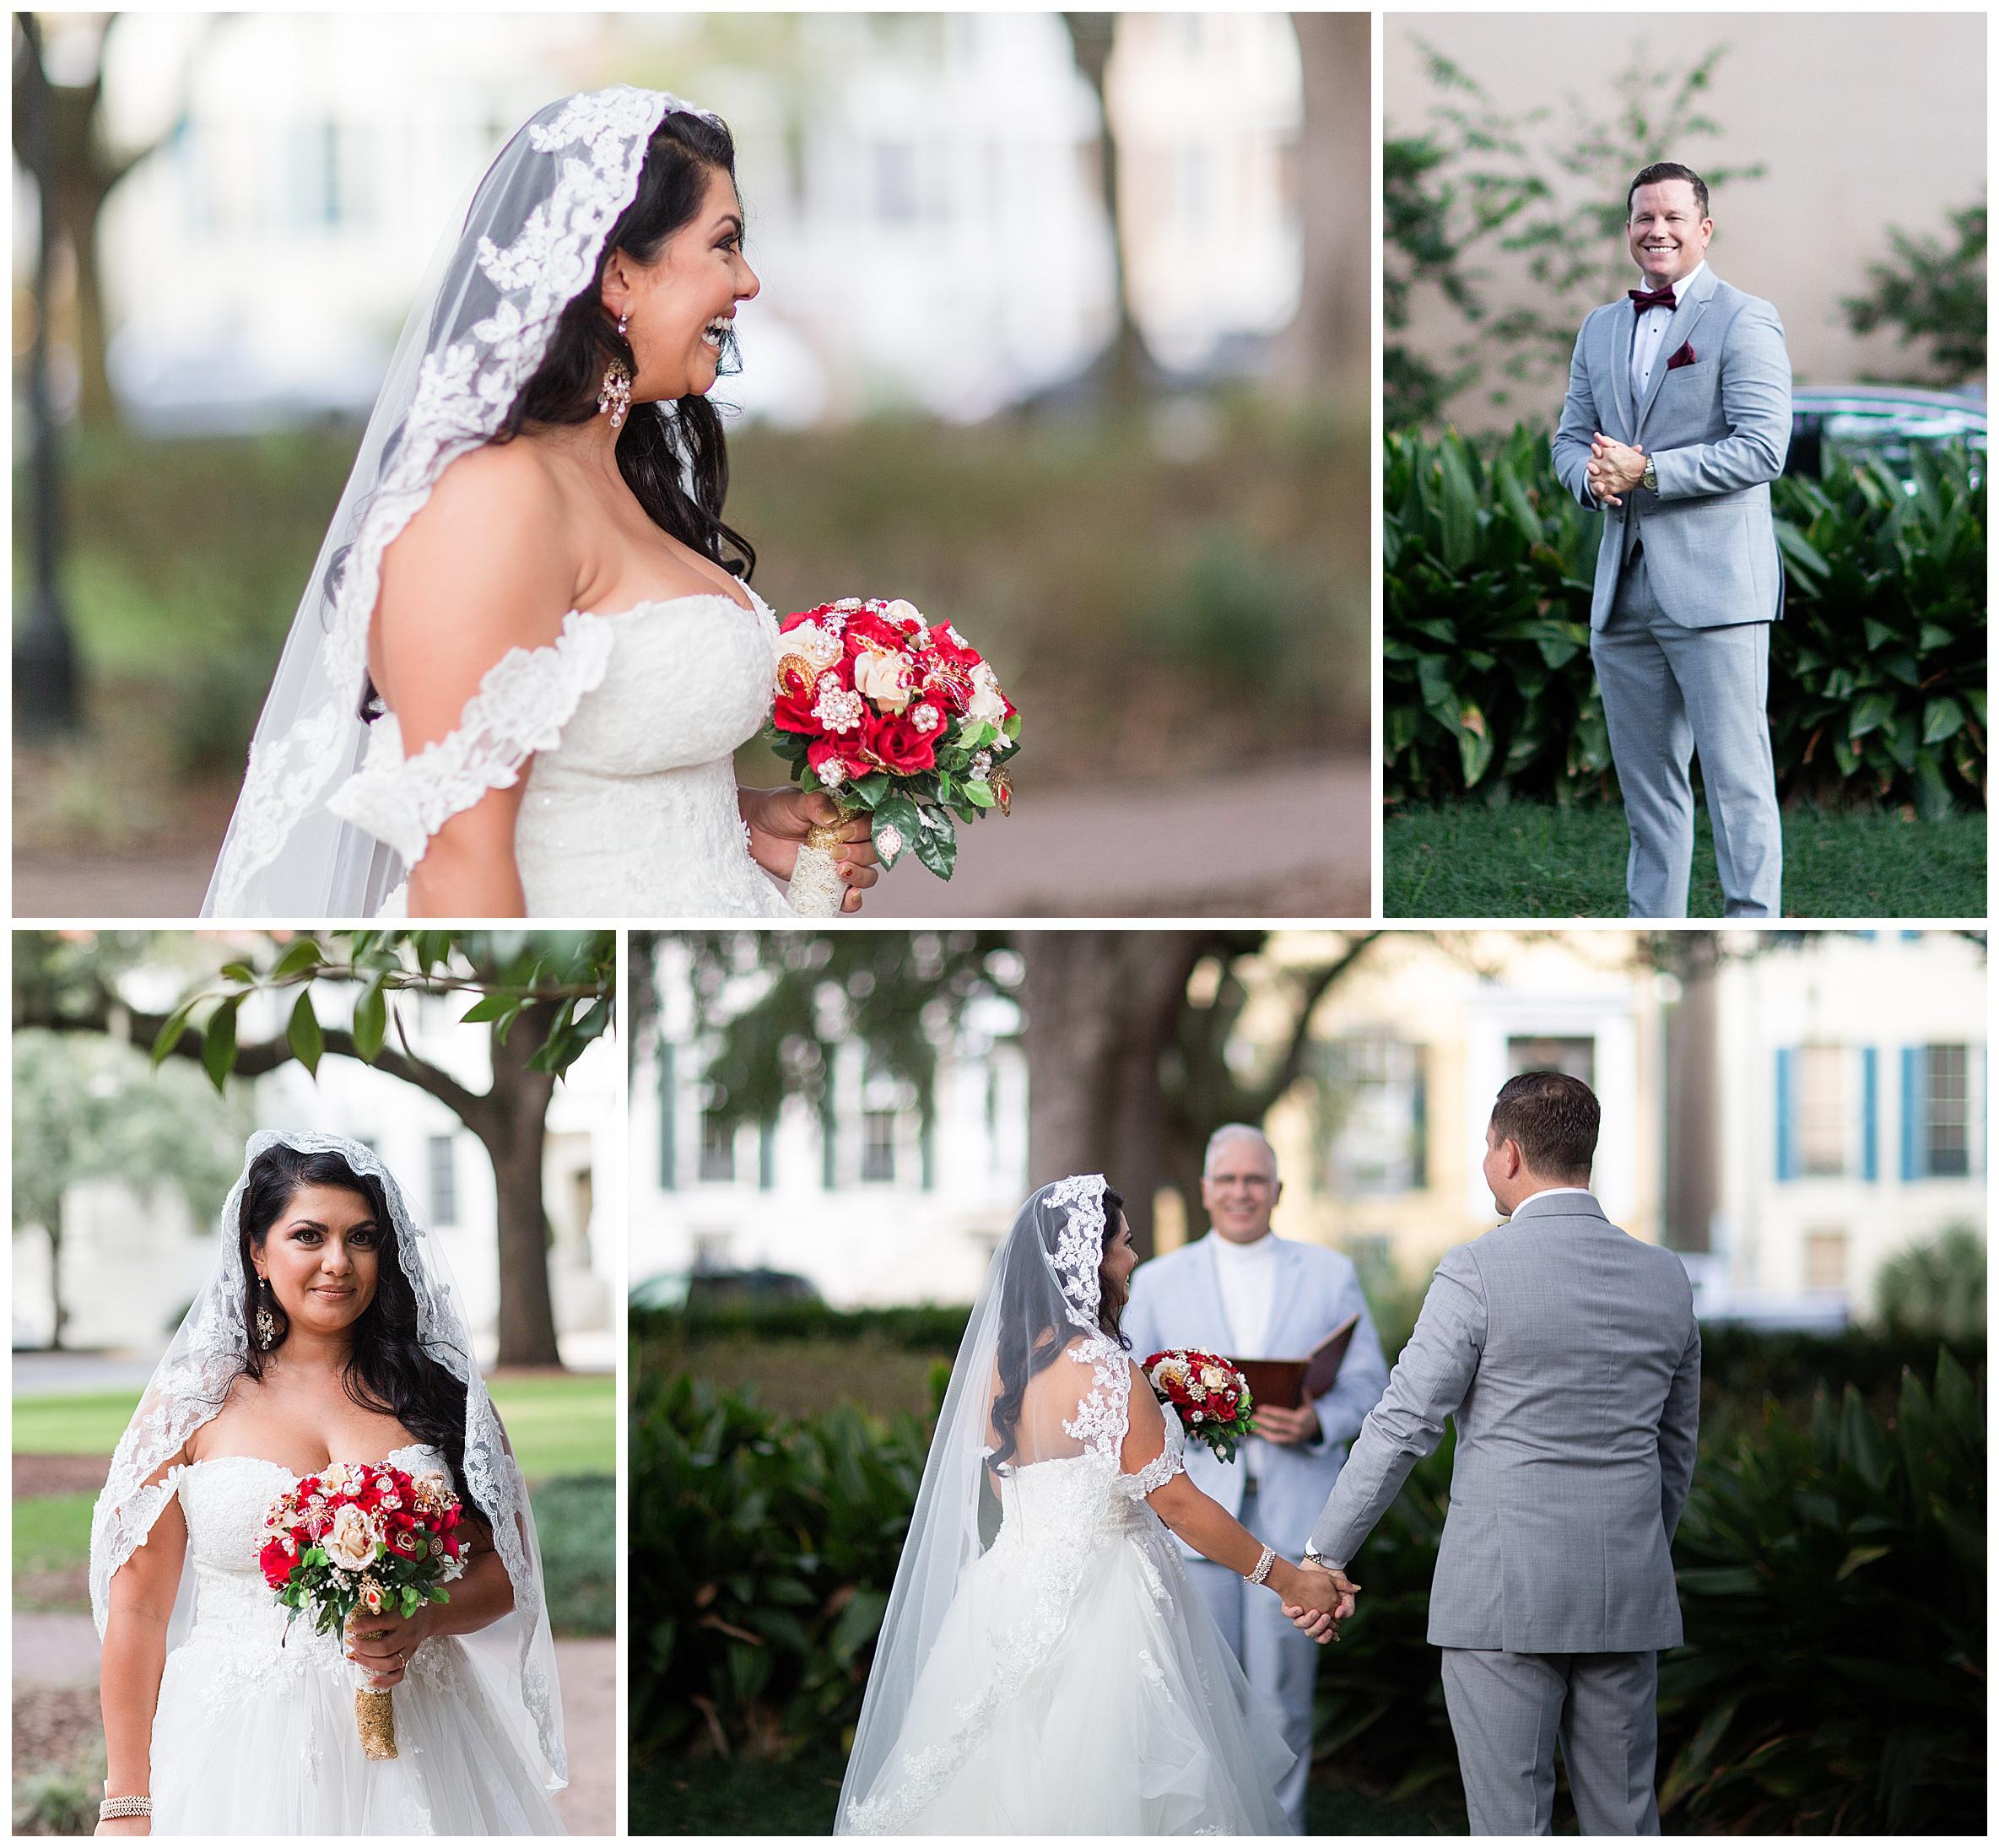 savannah elopement photography-3-1.jpg